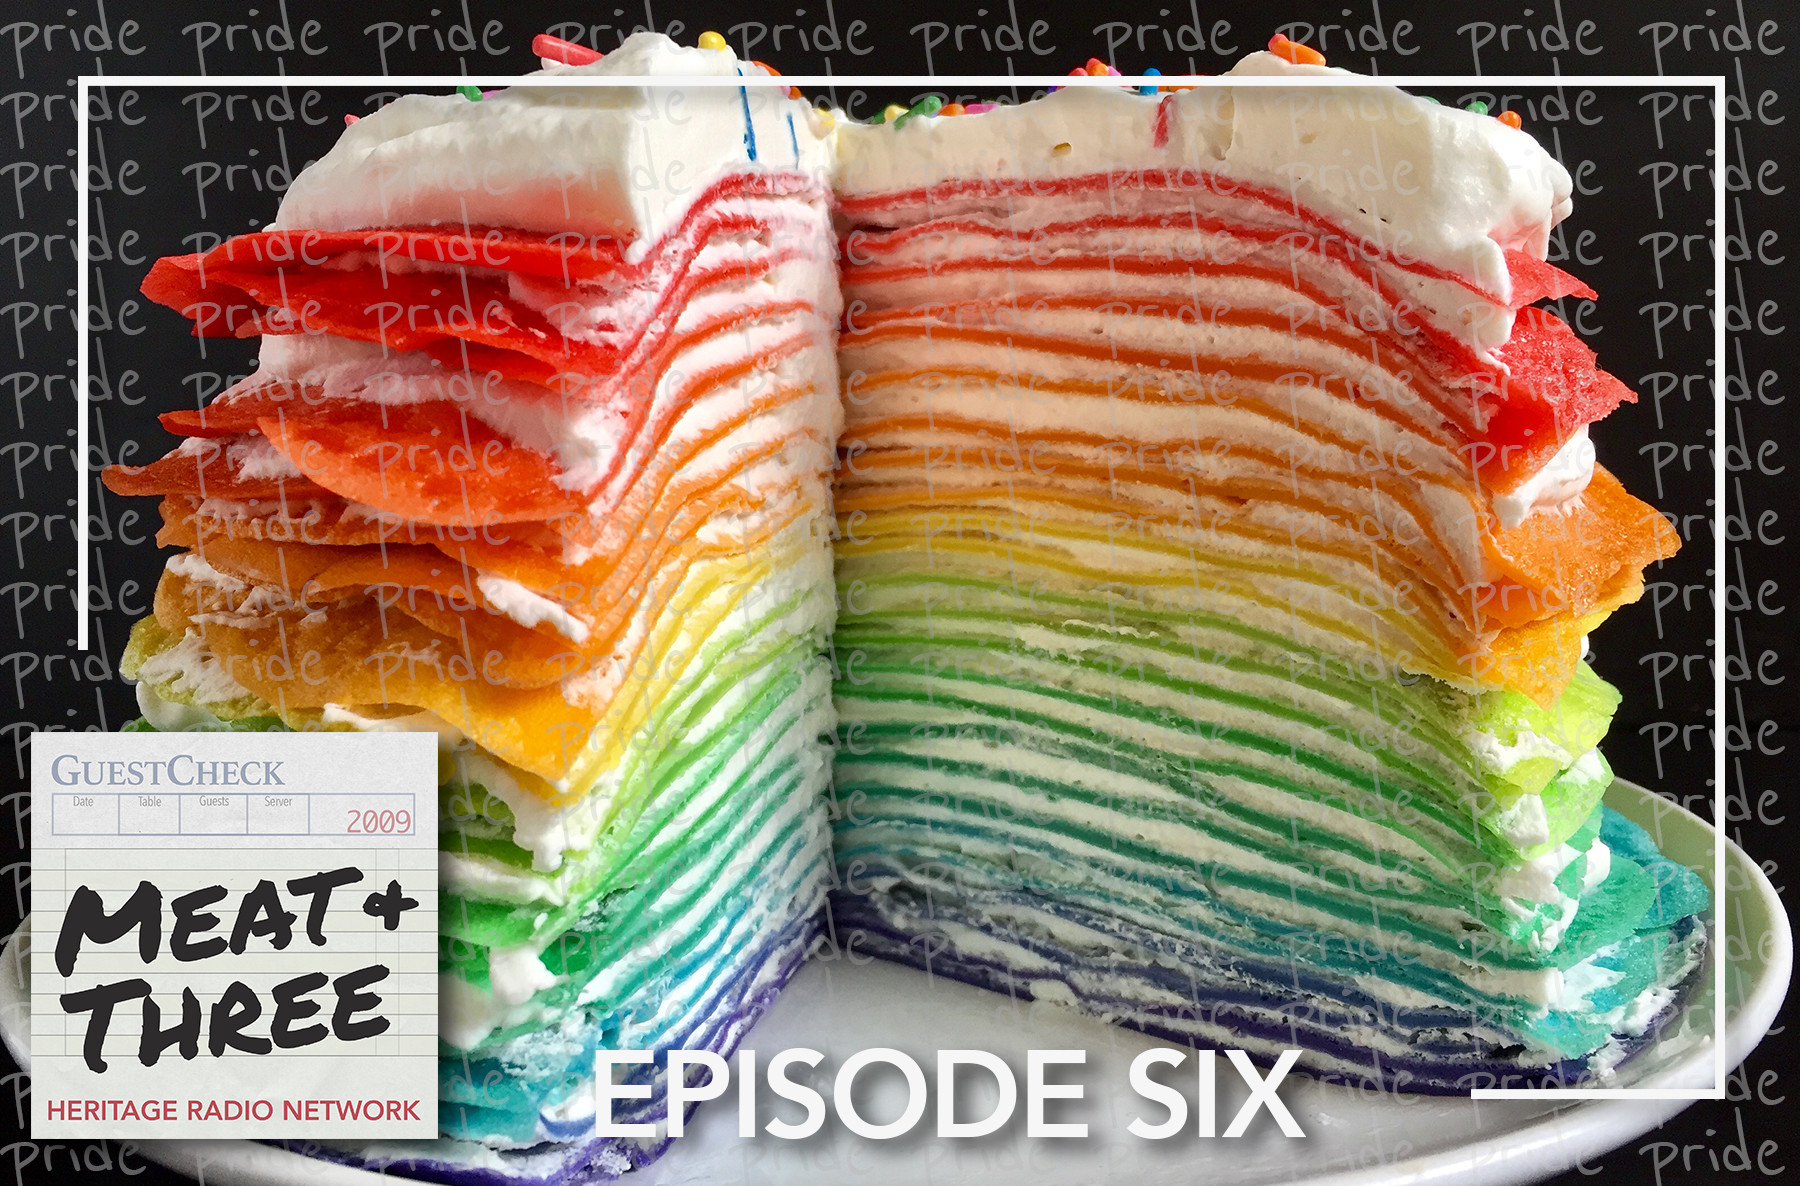 Episode 6 Image